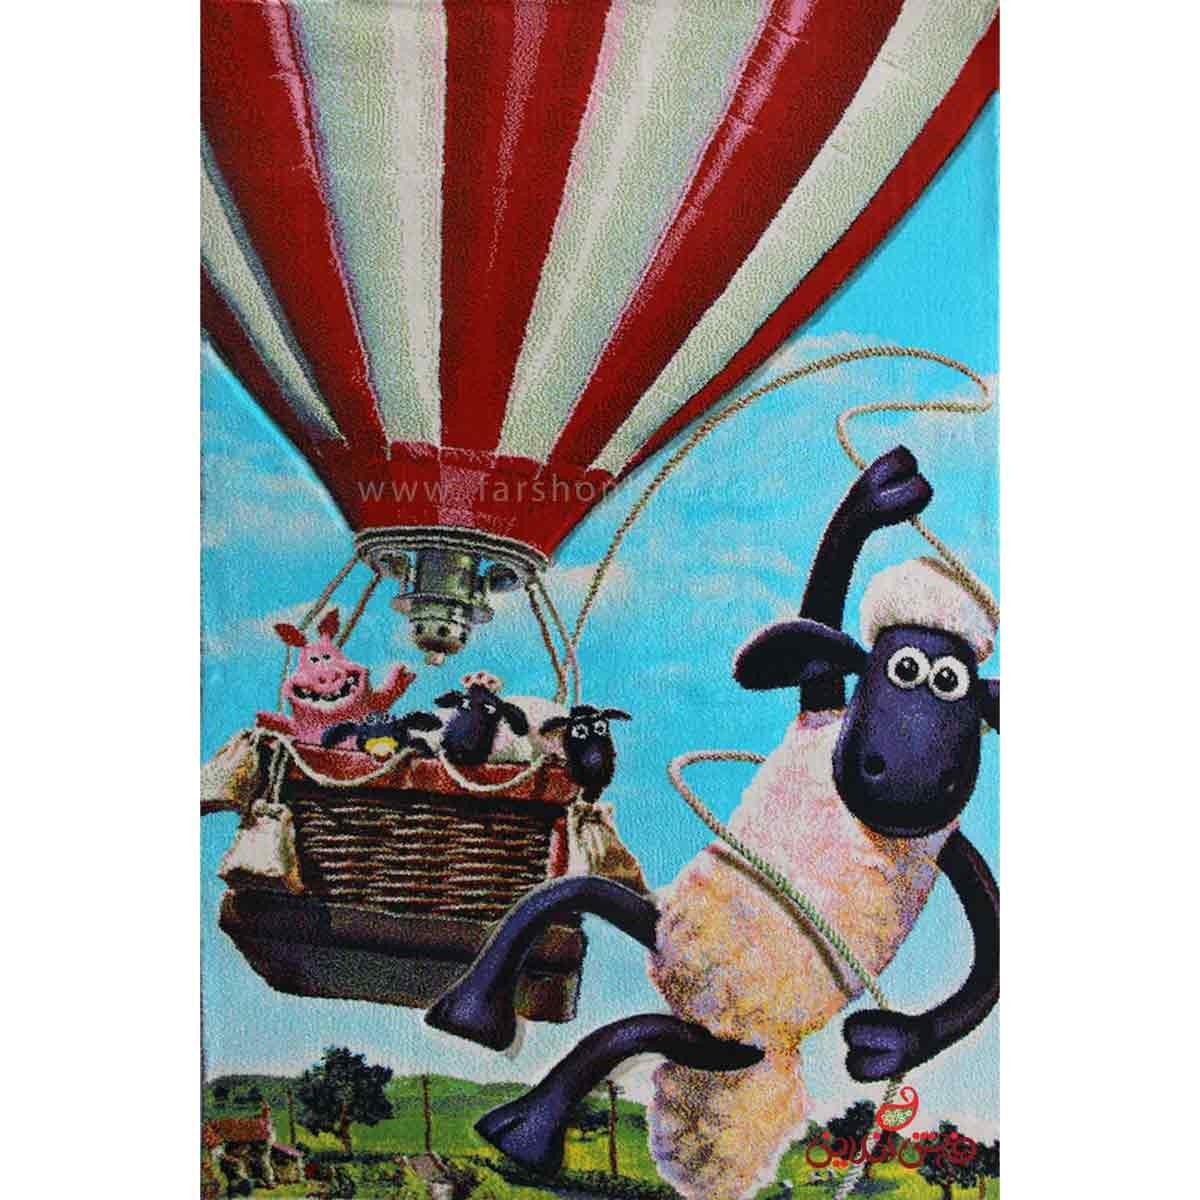 فرش کودک برلیان طرح گوسفند زبل کد 2072